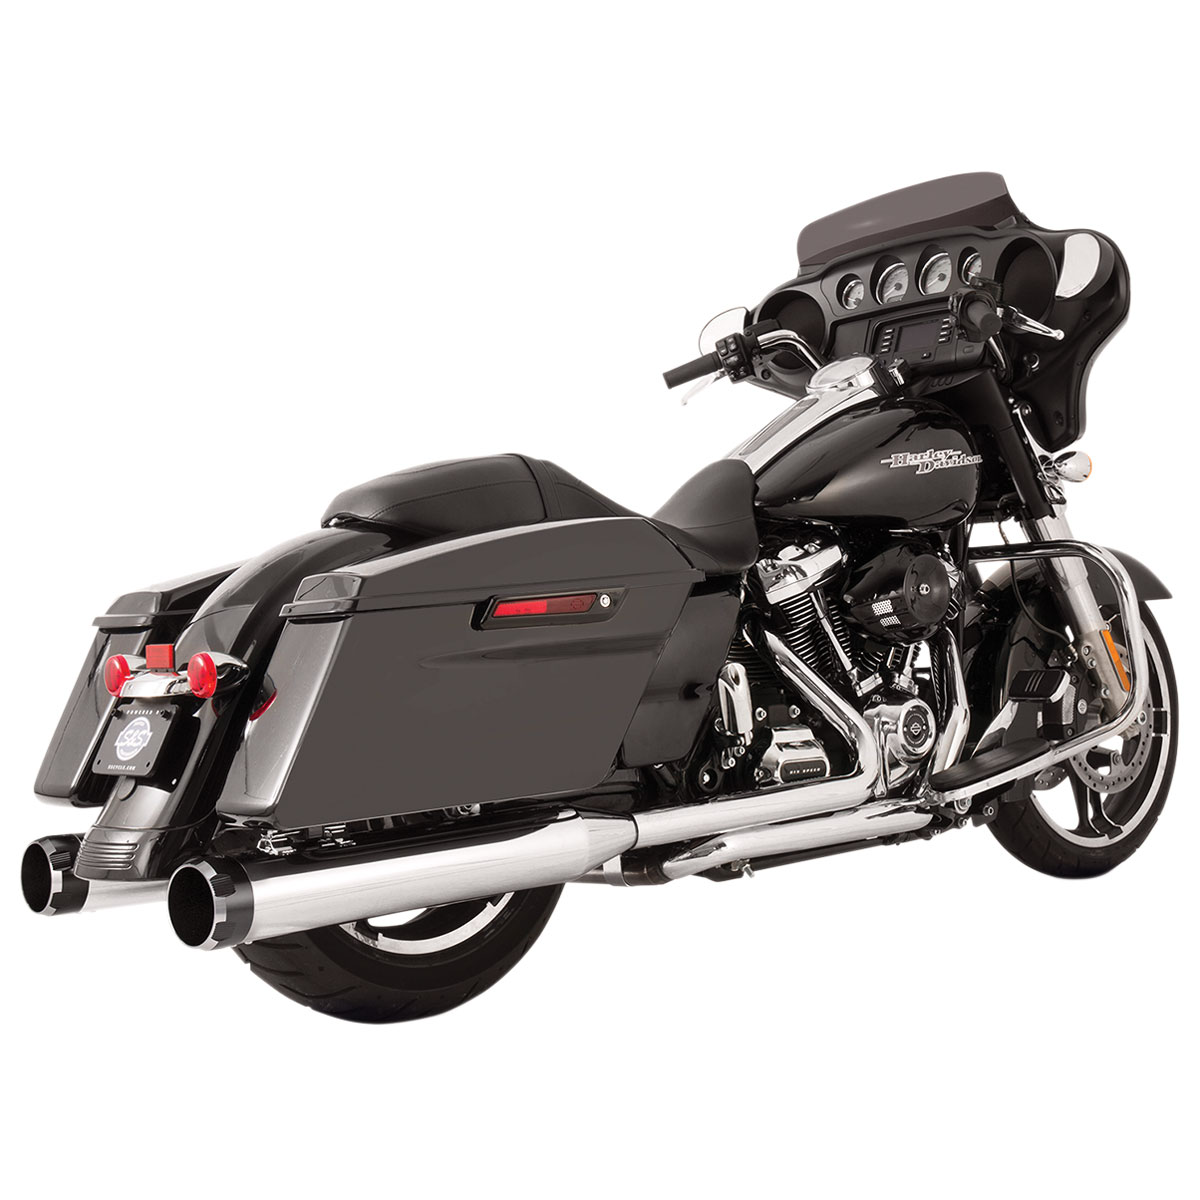 S&S Cycle MK45 El Dorado Exhaust Chrome with Thruster End Cap